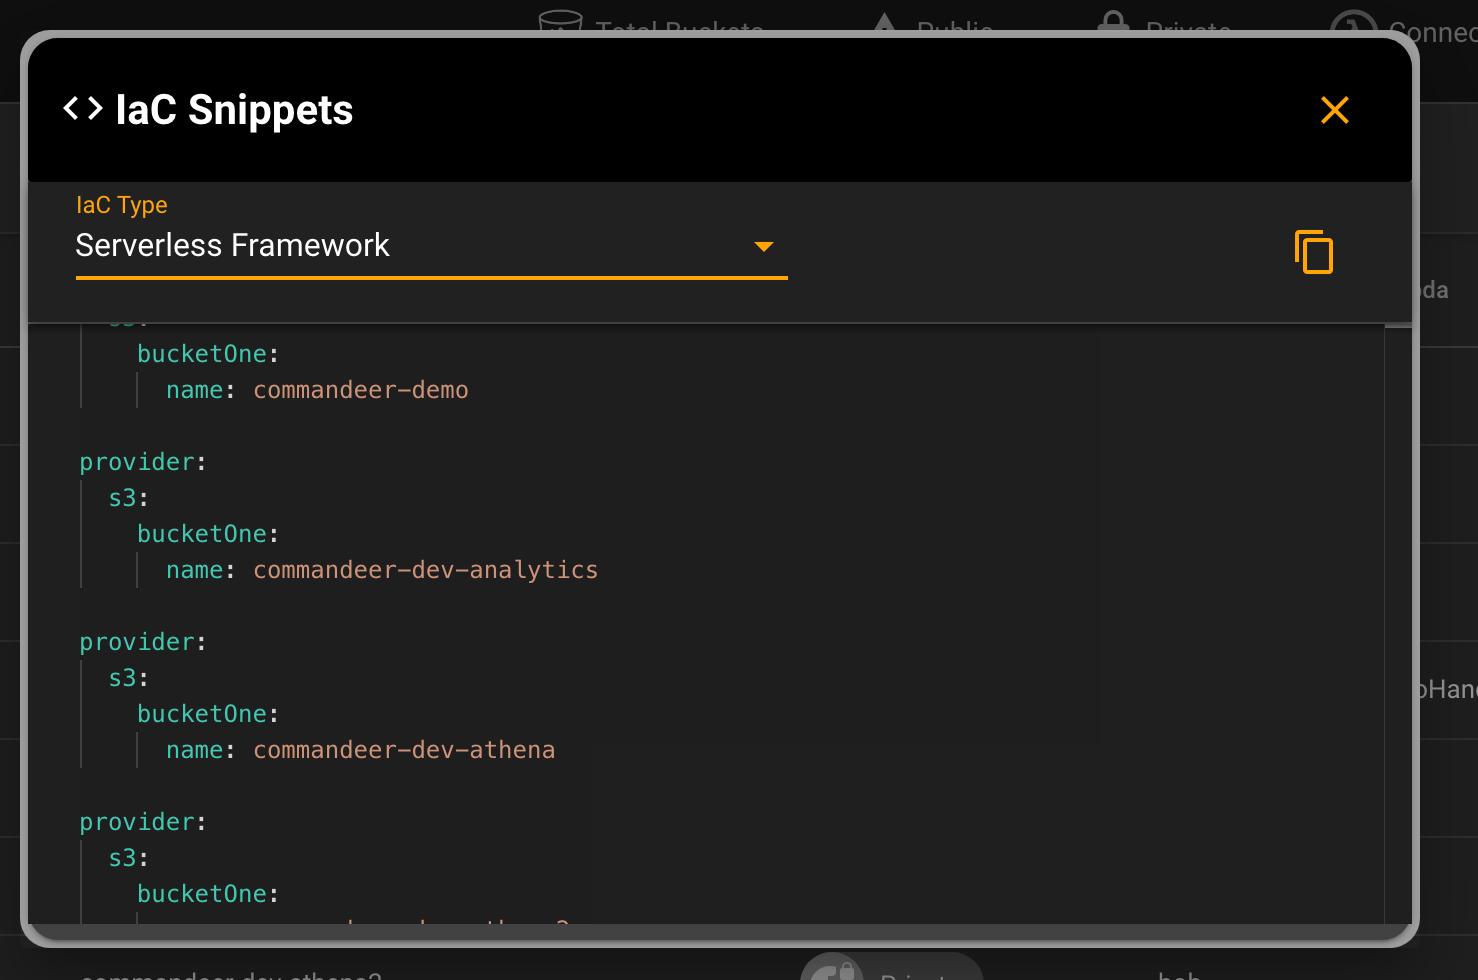 Serverless Framework IaC Snippet